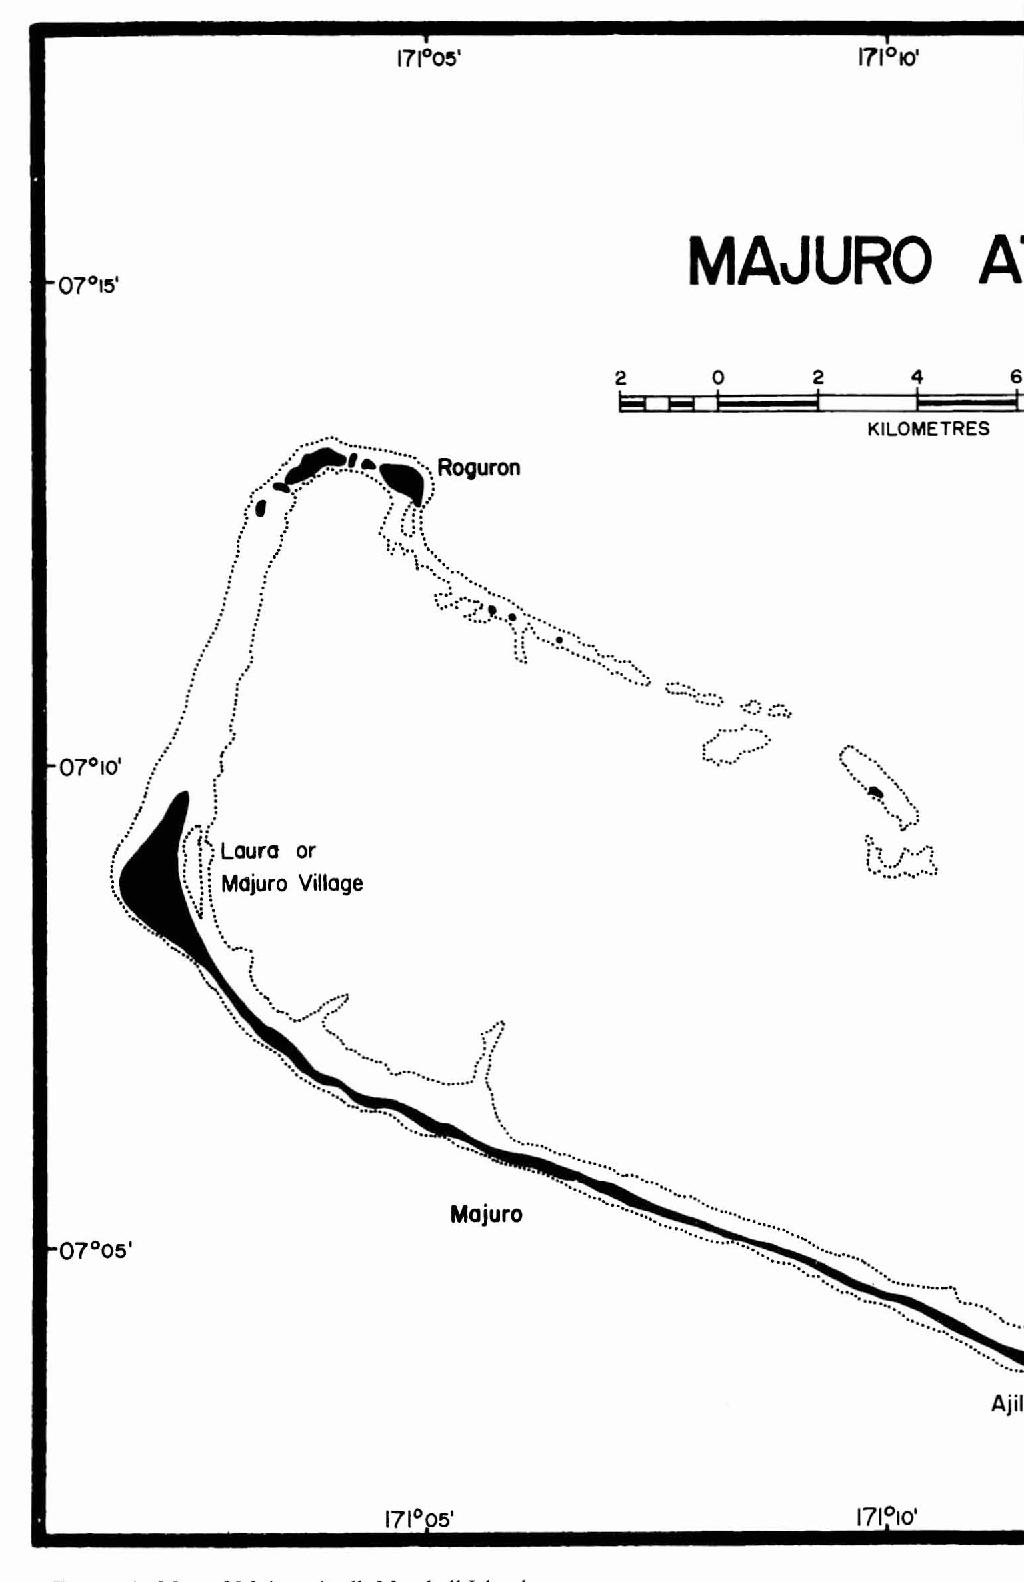 Figure I from Vegetation and Urbanization on Majuro Atoll ... on windhoek namibia map, western ghats mountains map, sofia bulgaria map, norfolk island, managua nicaragua map, wake island, nauru map, ebeye marshall islands map, marshall islands on map, kwajalein map, ebon atoll marshall islands map, vaduz liechtenstein map, samoa map, mili atoll marshall islands map, micronesia marshall islands map, south georgia and the south sandwich islands, republic of marshall islands map, majuro airport map, swiss map, pago pago, christmas island, port vila, marshall islands international airport, marshall islands pacific map, cocos islands, palau map, marshall islands world map, tarawa atoll,